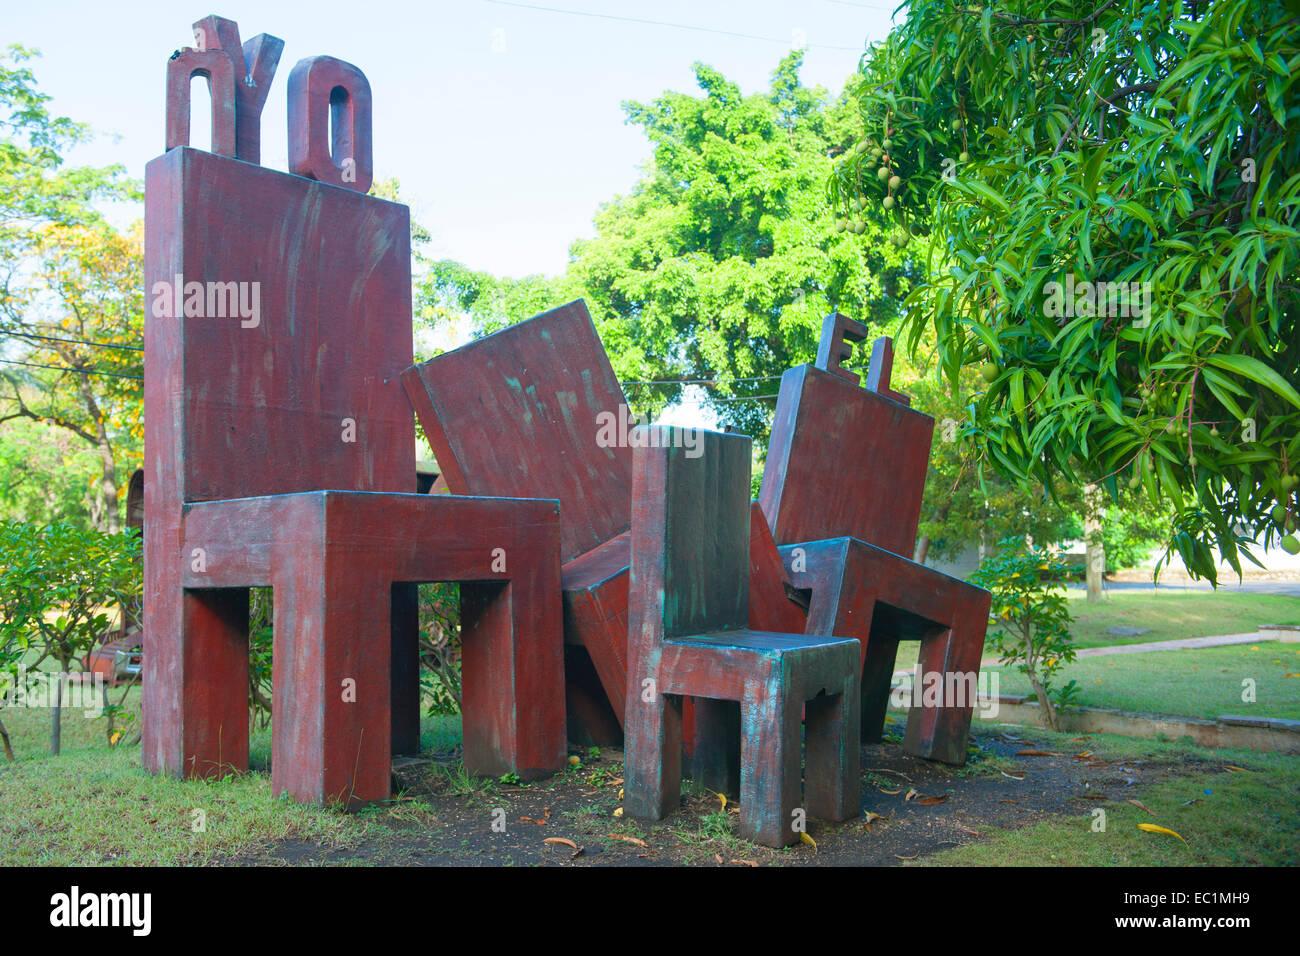 Dominikanische Republik, Santo Domingo, Parque de la Cultura, Skulpturenpark vor dem Museo de Arte Moderno - Stock Image